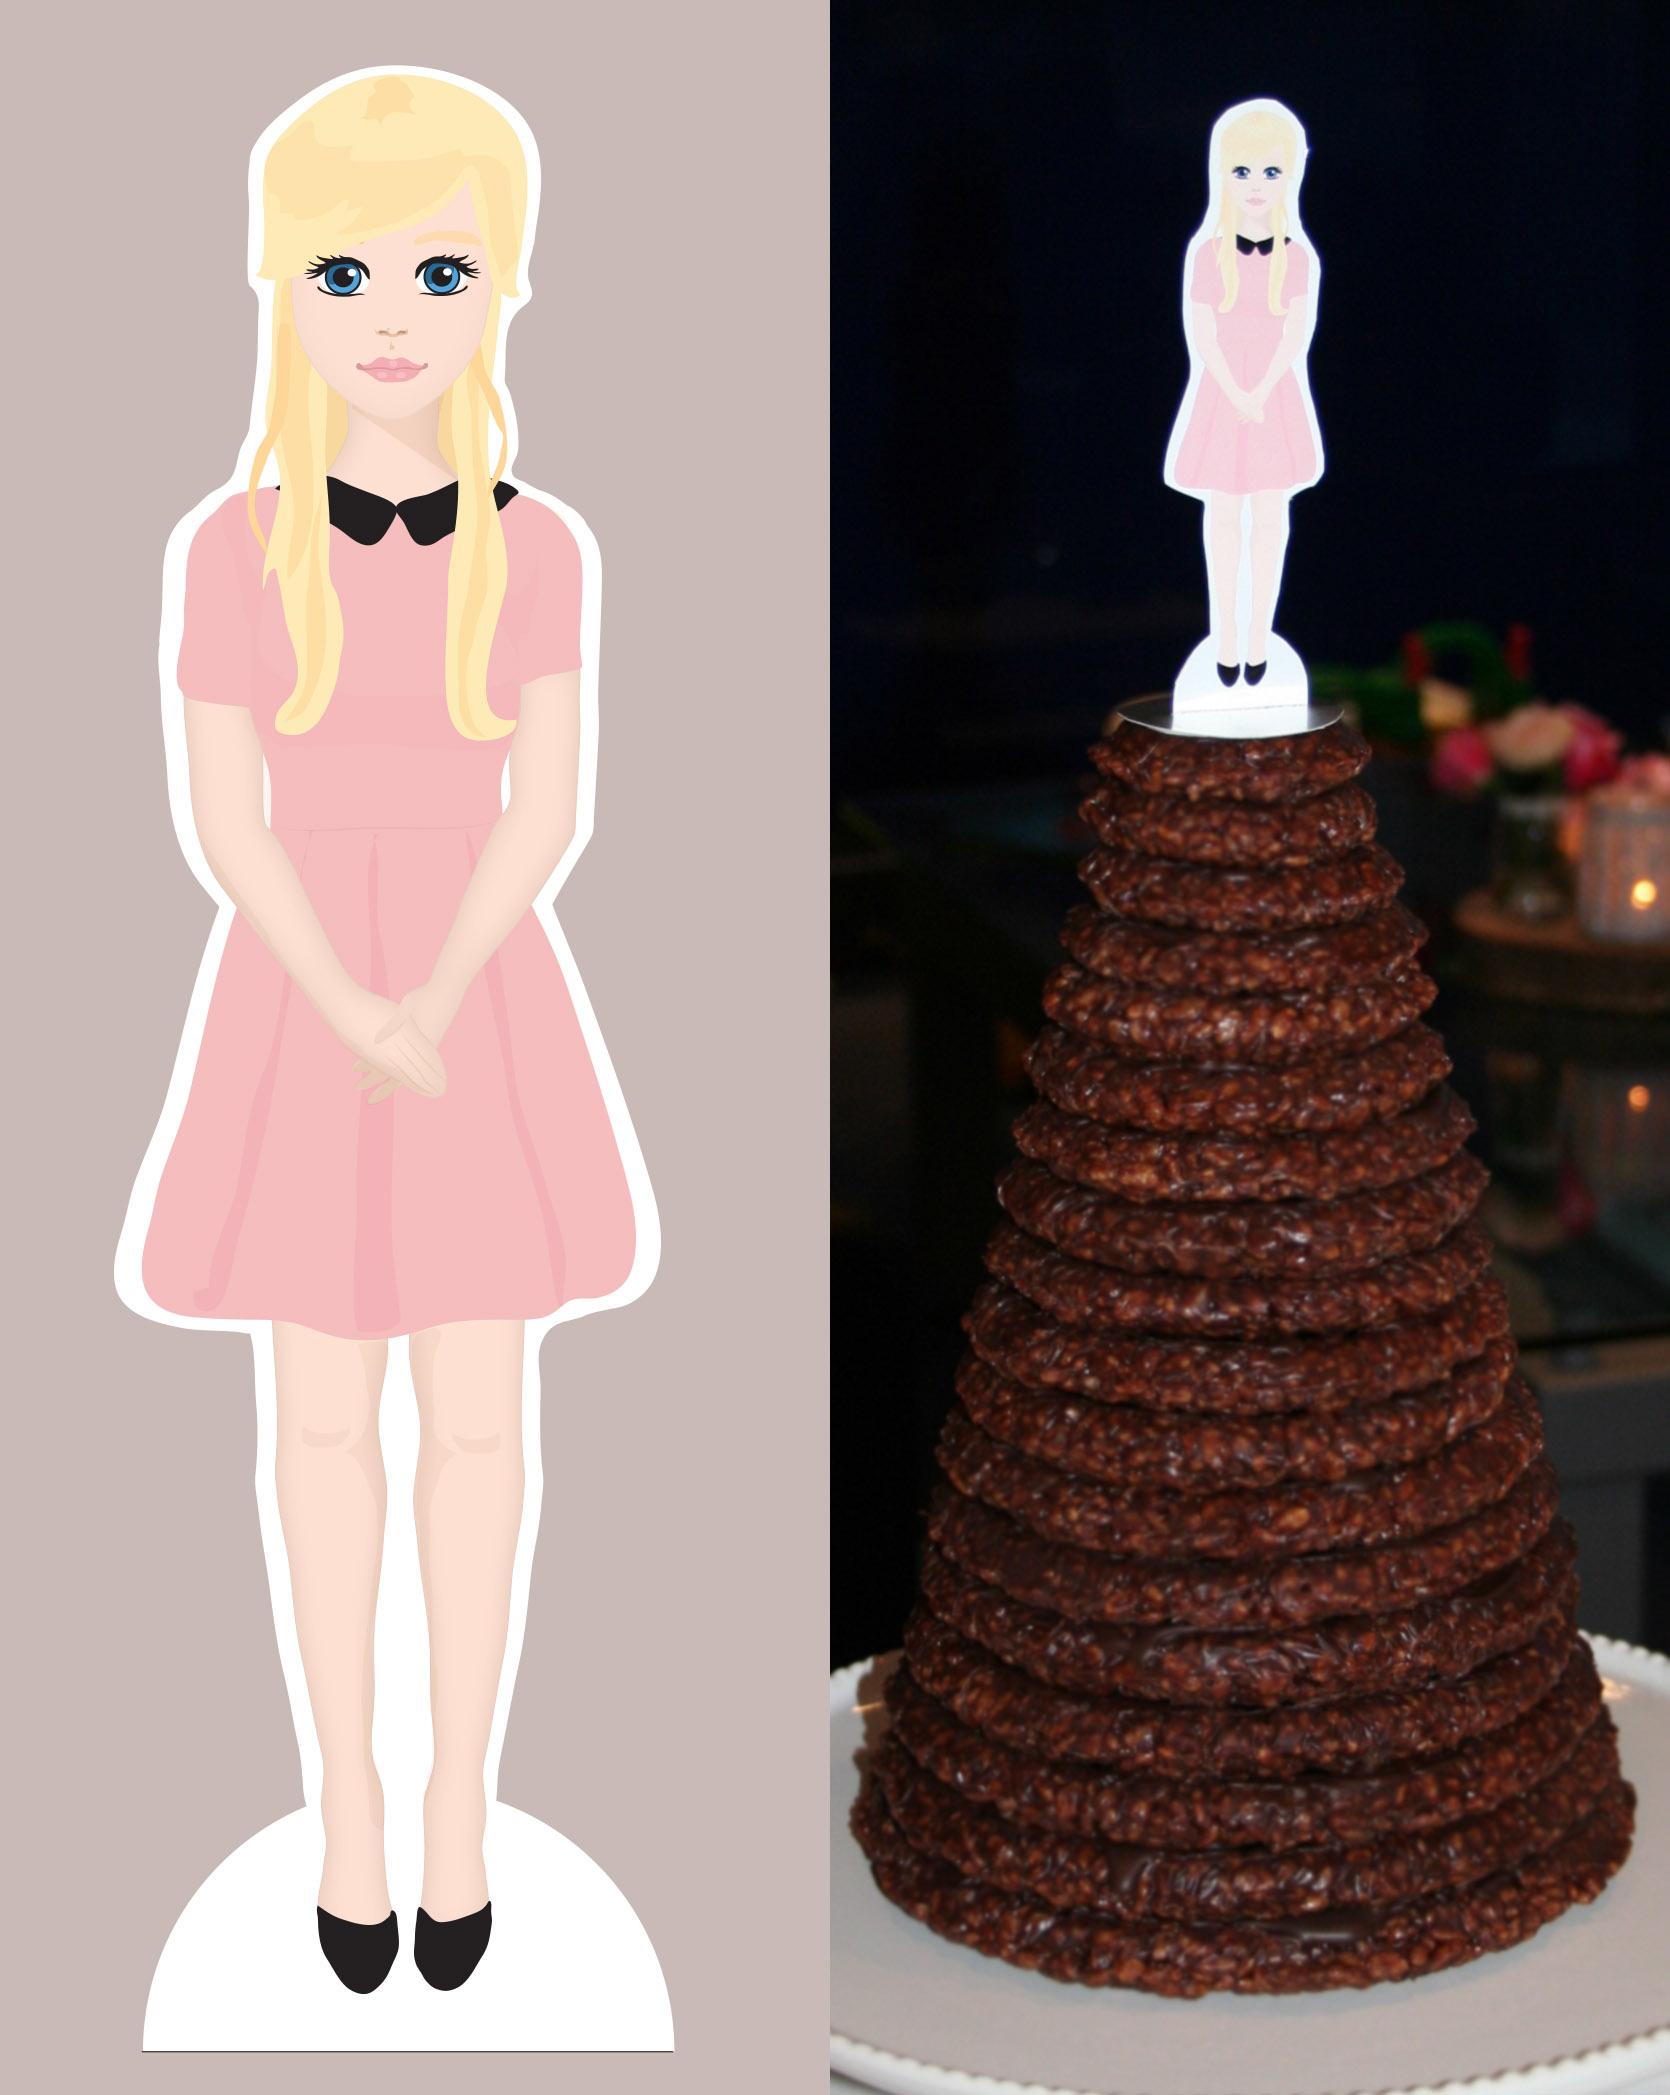 Kökutoppur / cake top - oddny.com